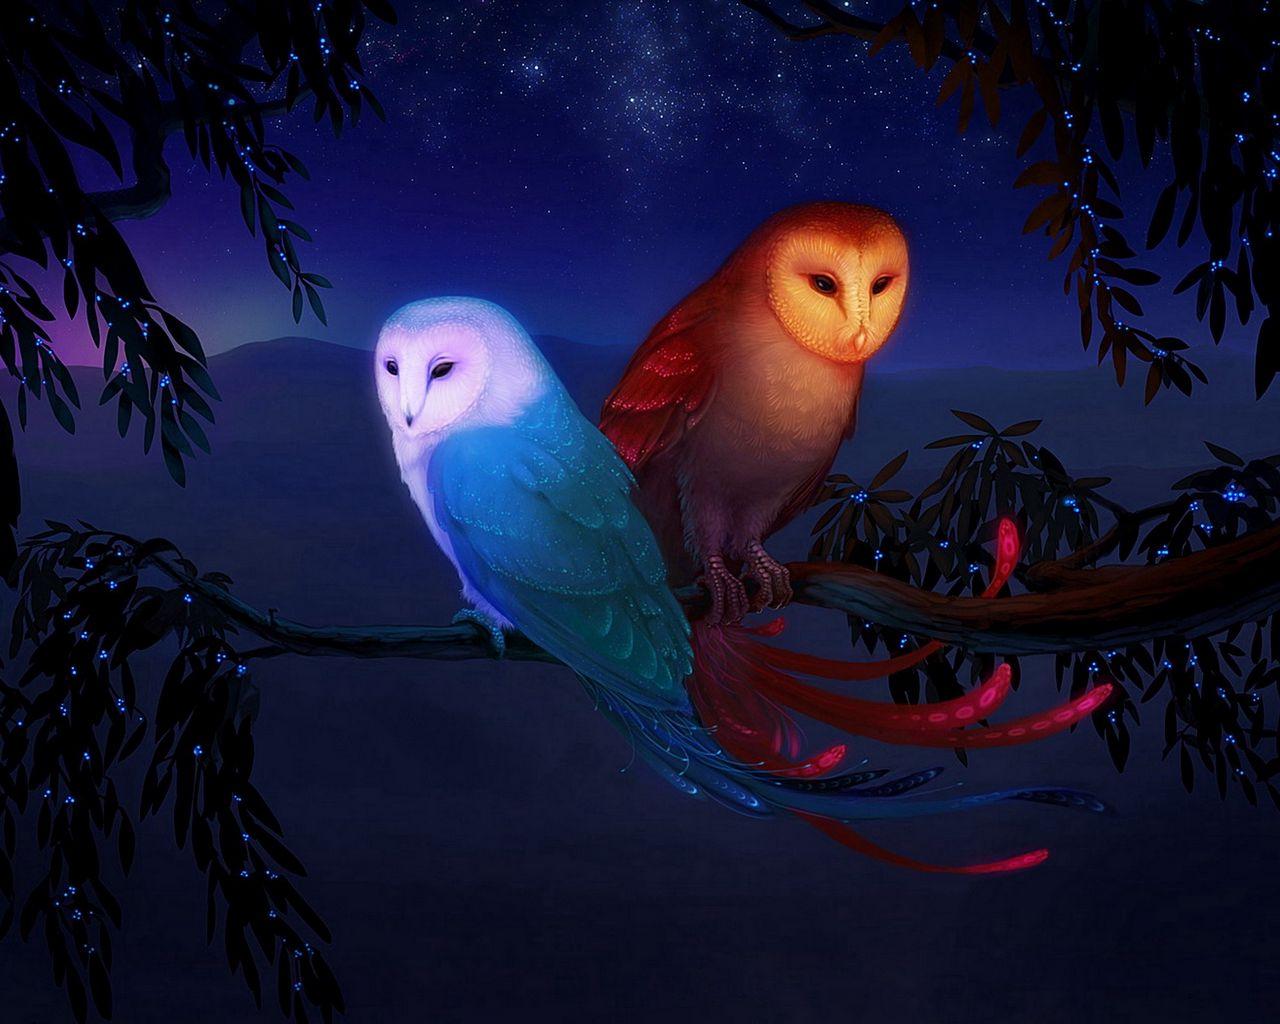 1280x1024 Wallpaper owl, night, birds, branch